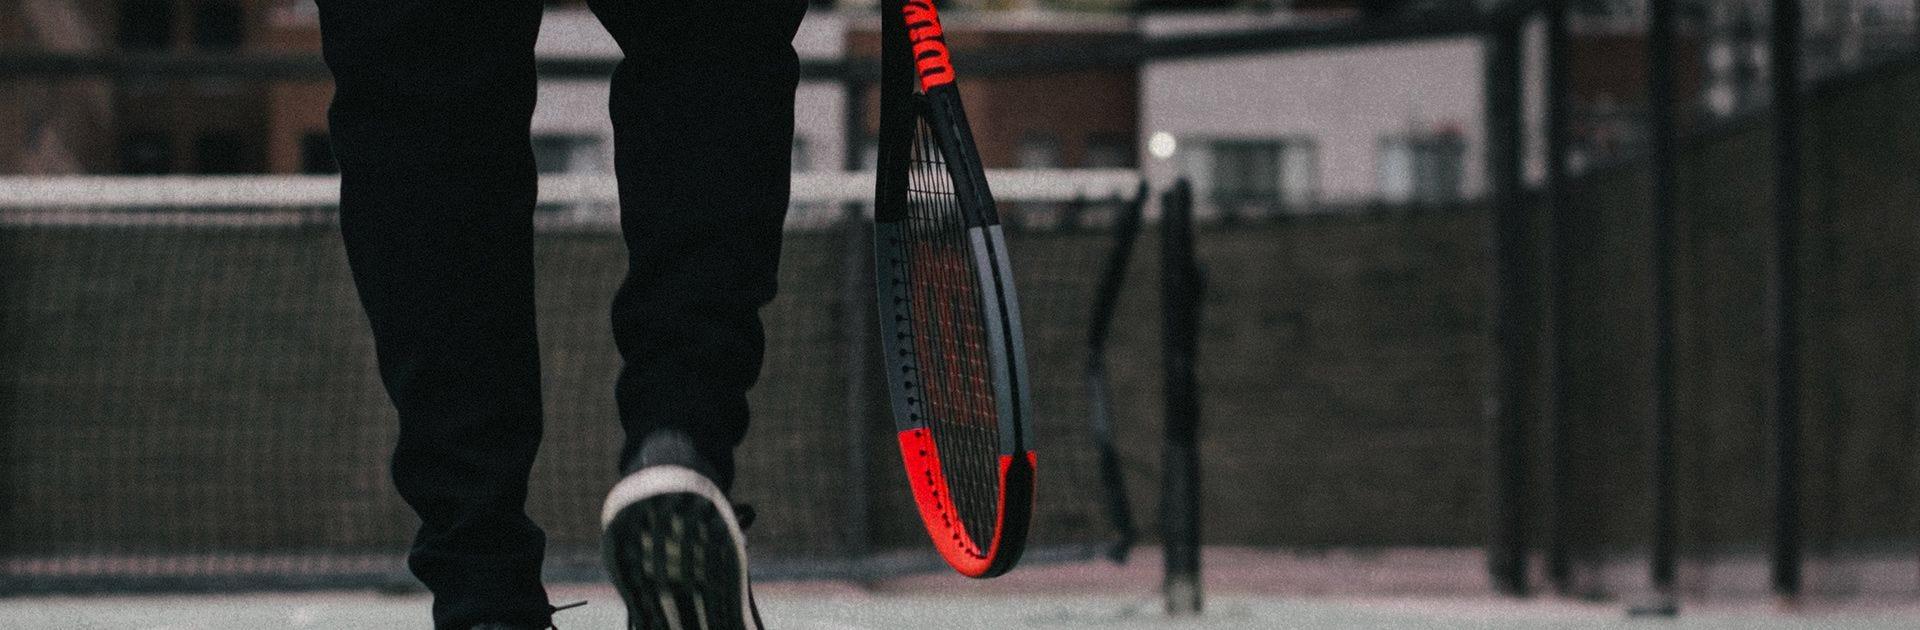 3c821be8af Wilson Tennis Rackets